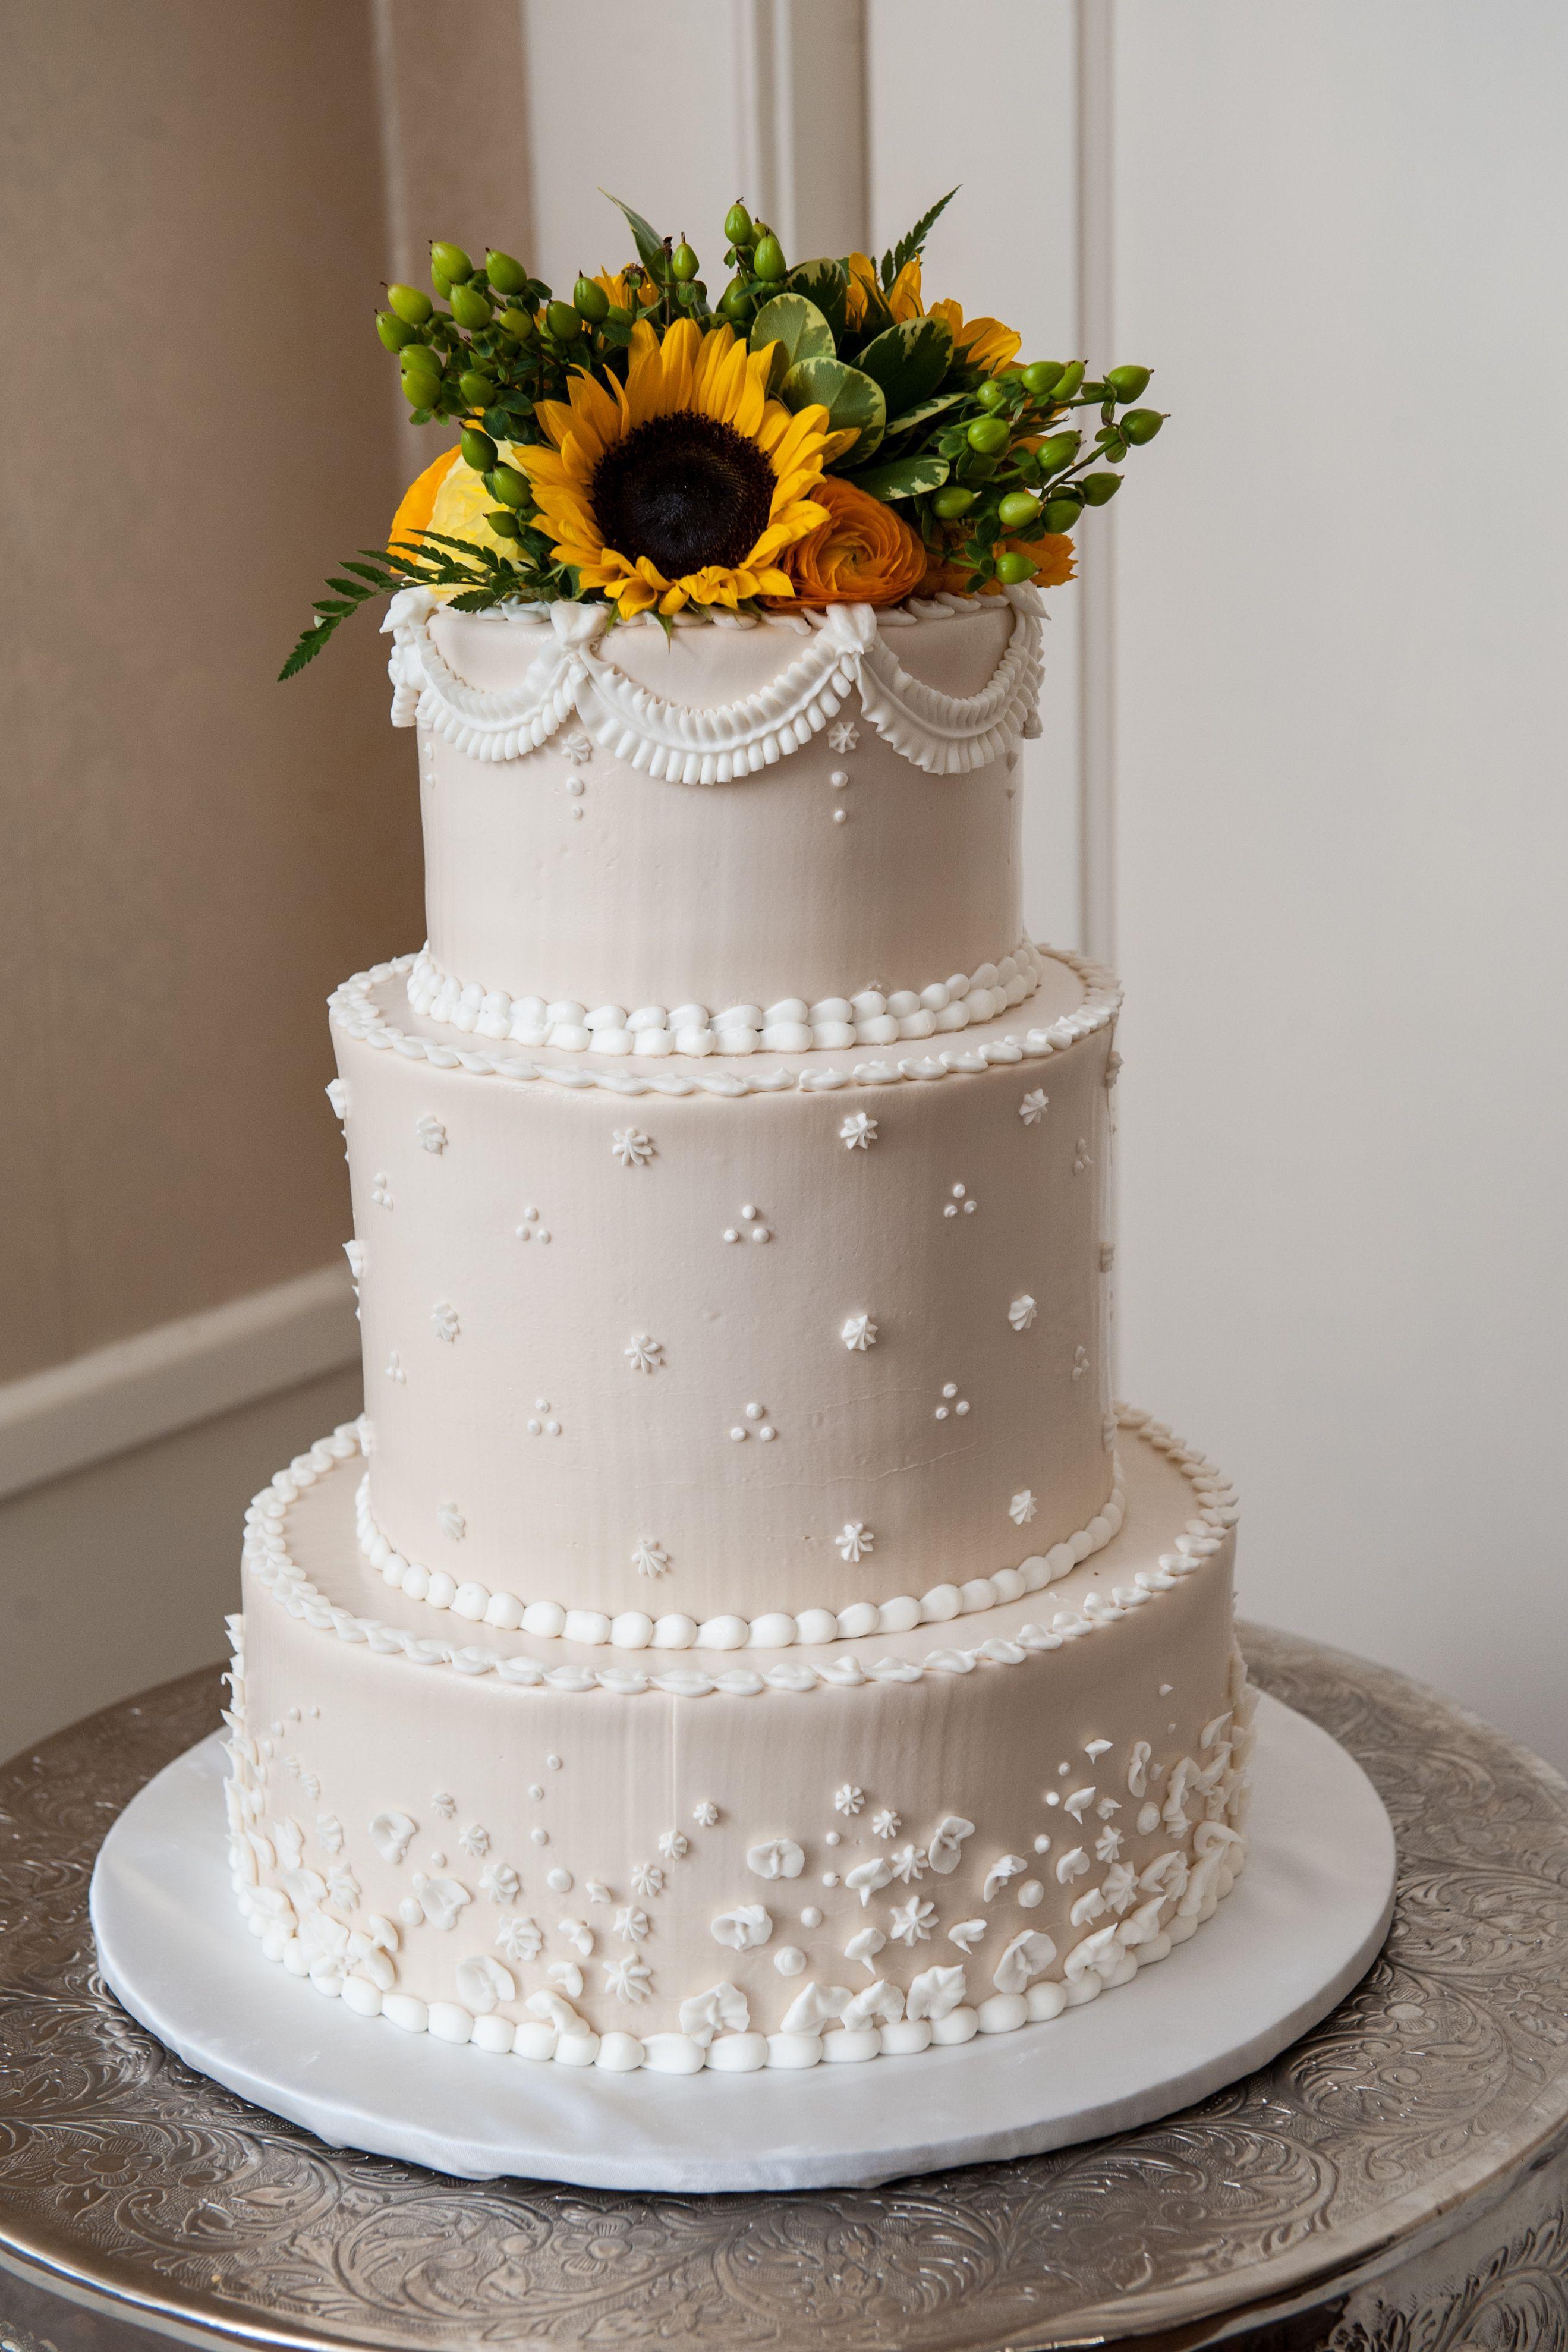 Wedding Cake with Sunflowers Sunflower wedding cake